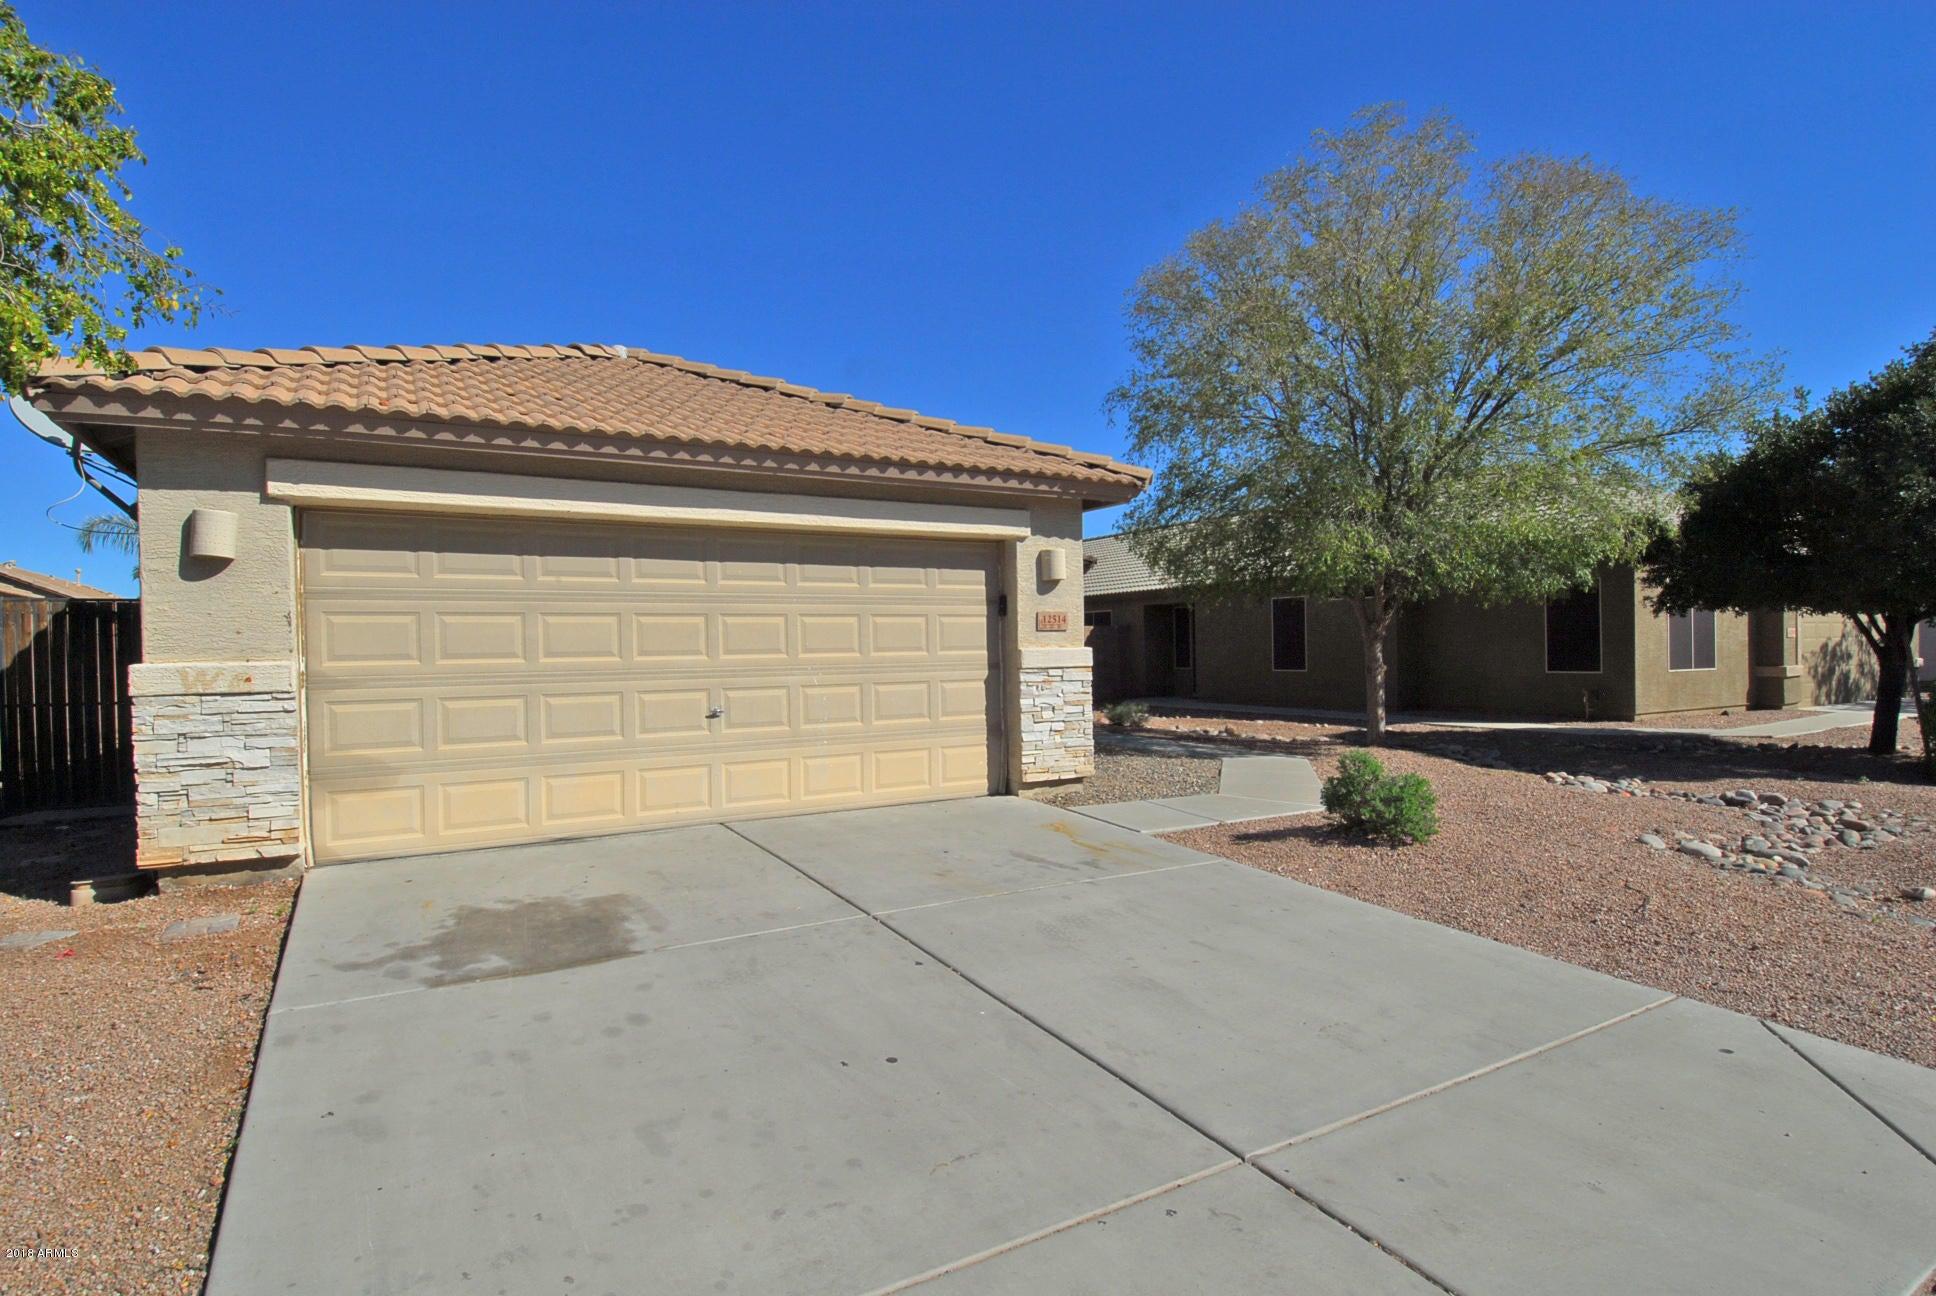 MLS 5835969 12514 W LINCOLN Street, Avondale, AZ 85323 Avondale AZ Golf